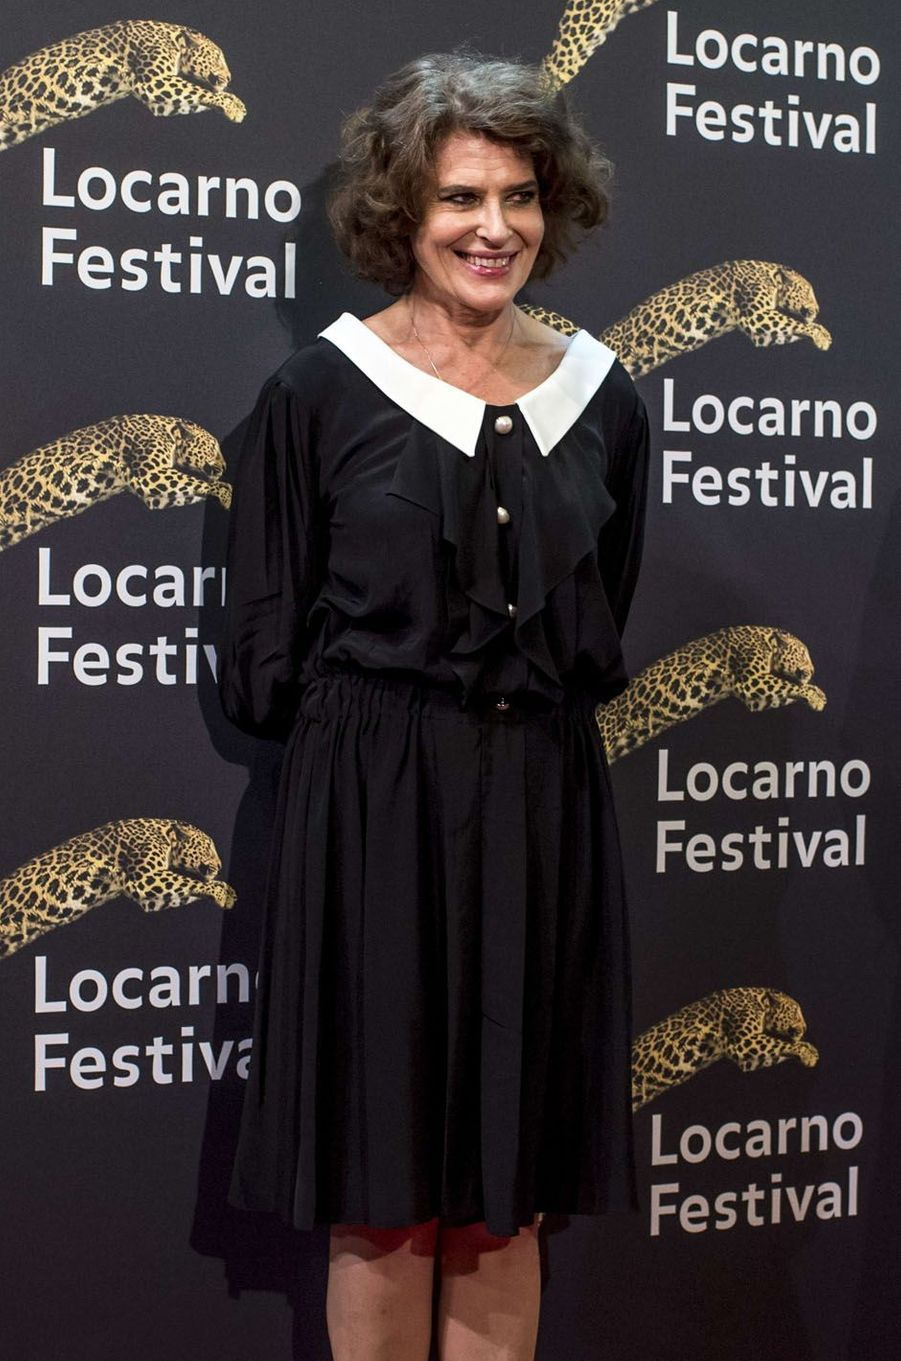 Fanny Ardantau festival de Loncarno, le 3 août 2017.